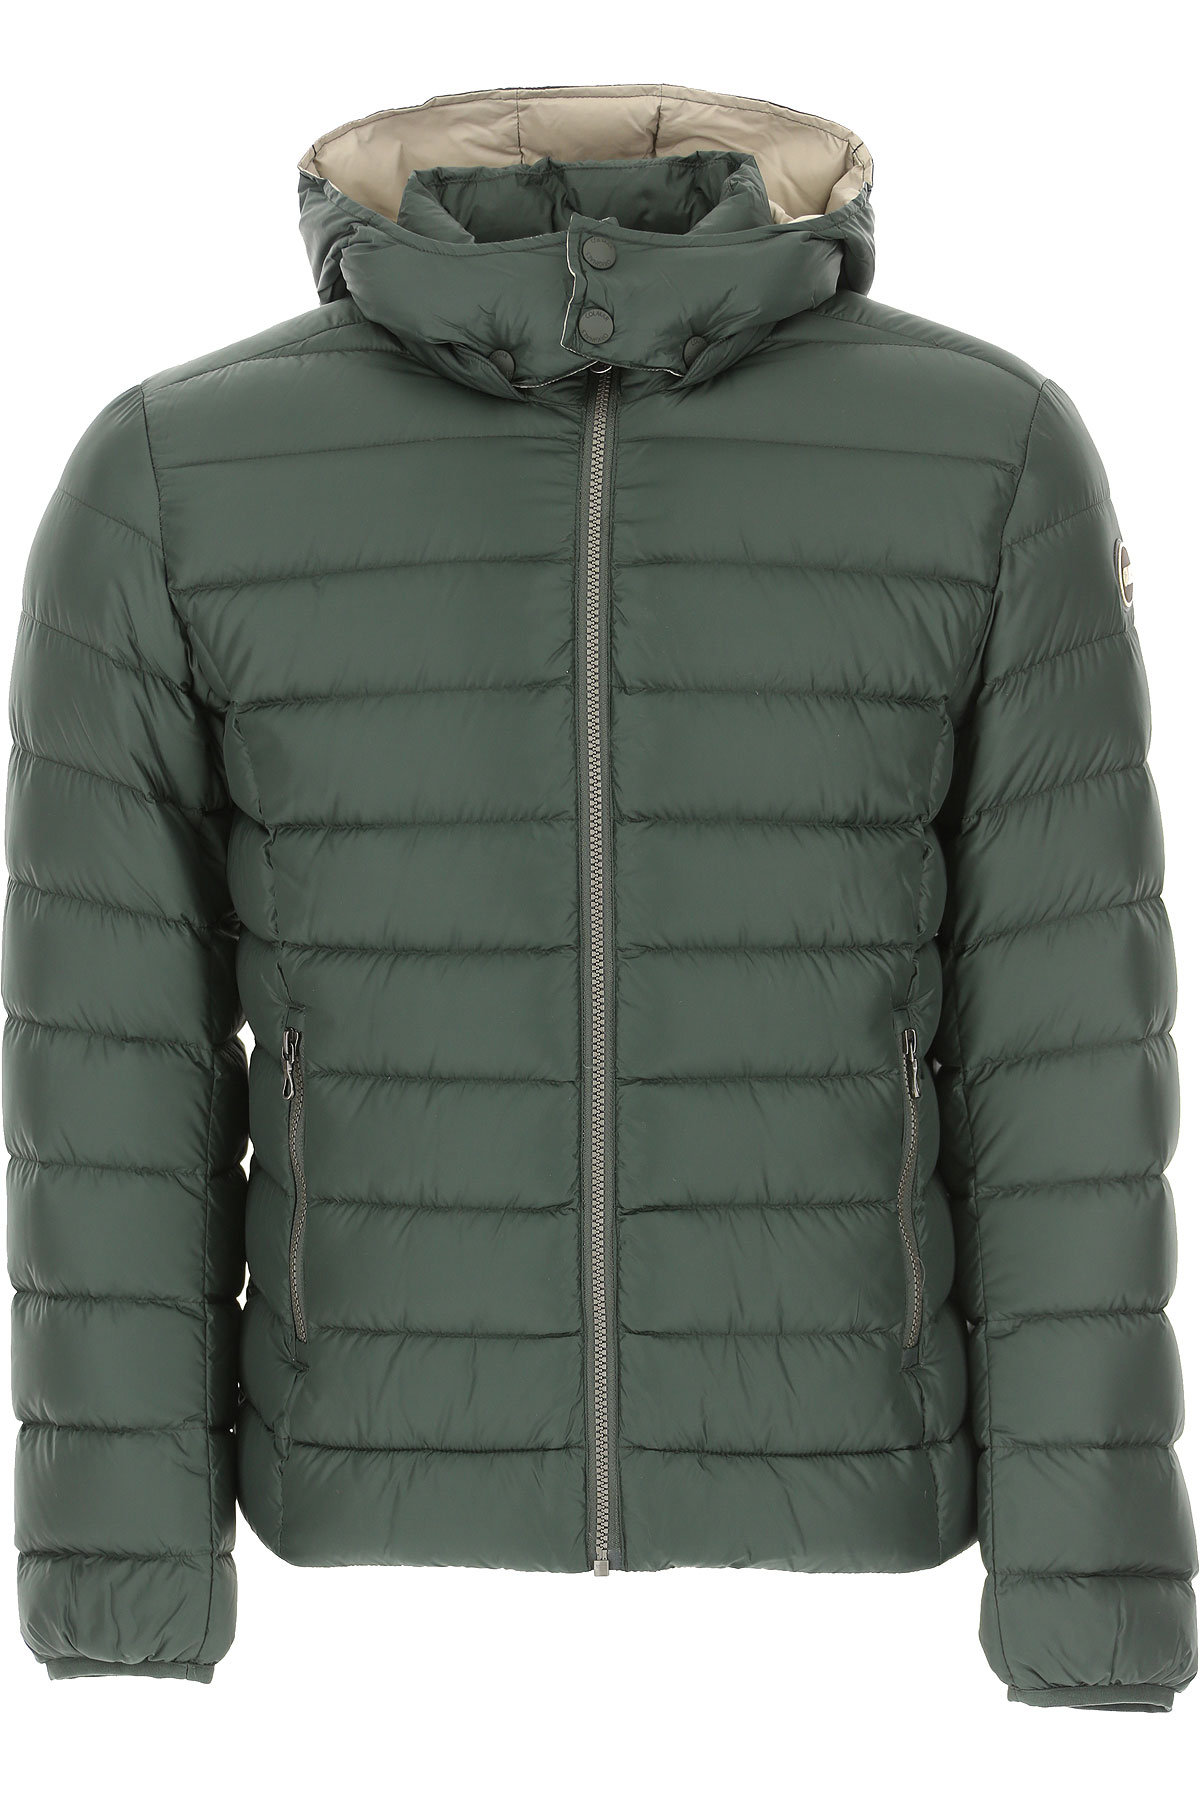 Colmar Down Jacket for Men, Puffer Ski Jacket On Sale, Dark Bottle Green, polyester, 2019, L M S XXL